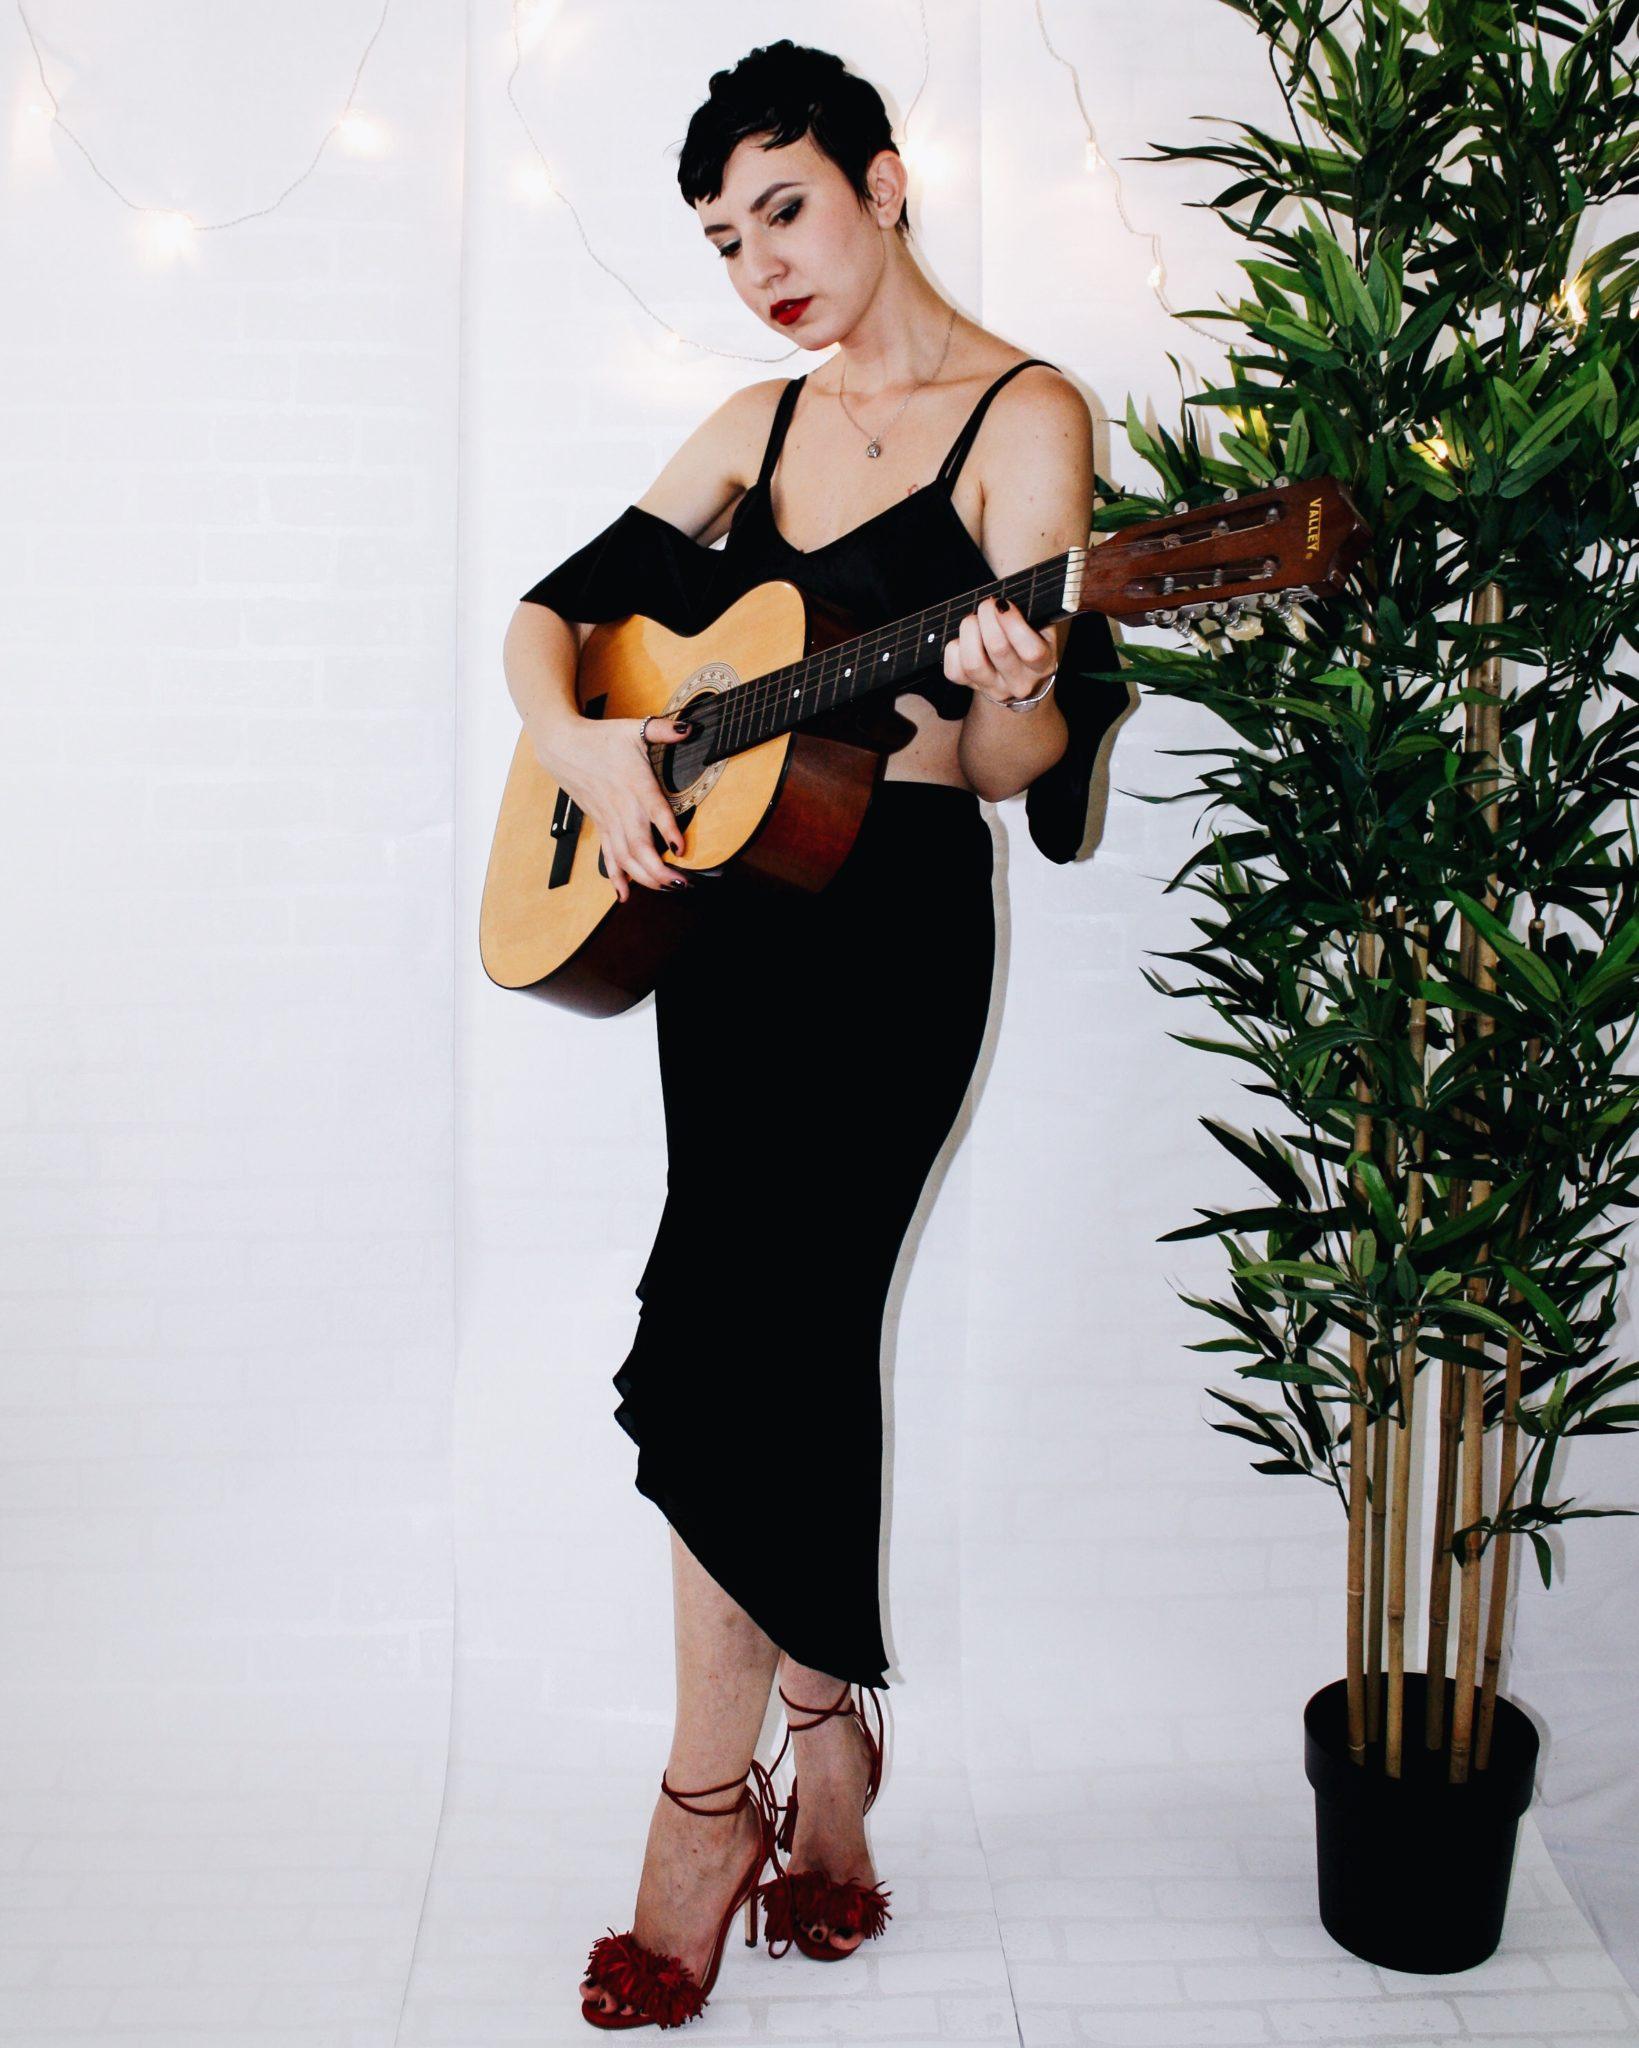 spanish revival bardot top missguided dvf skirt aquazzura shoe guitar zara bag 7